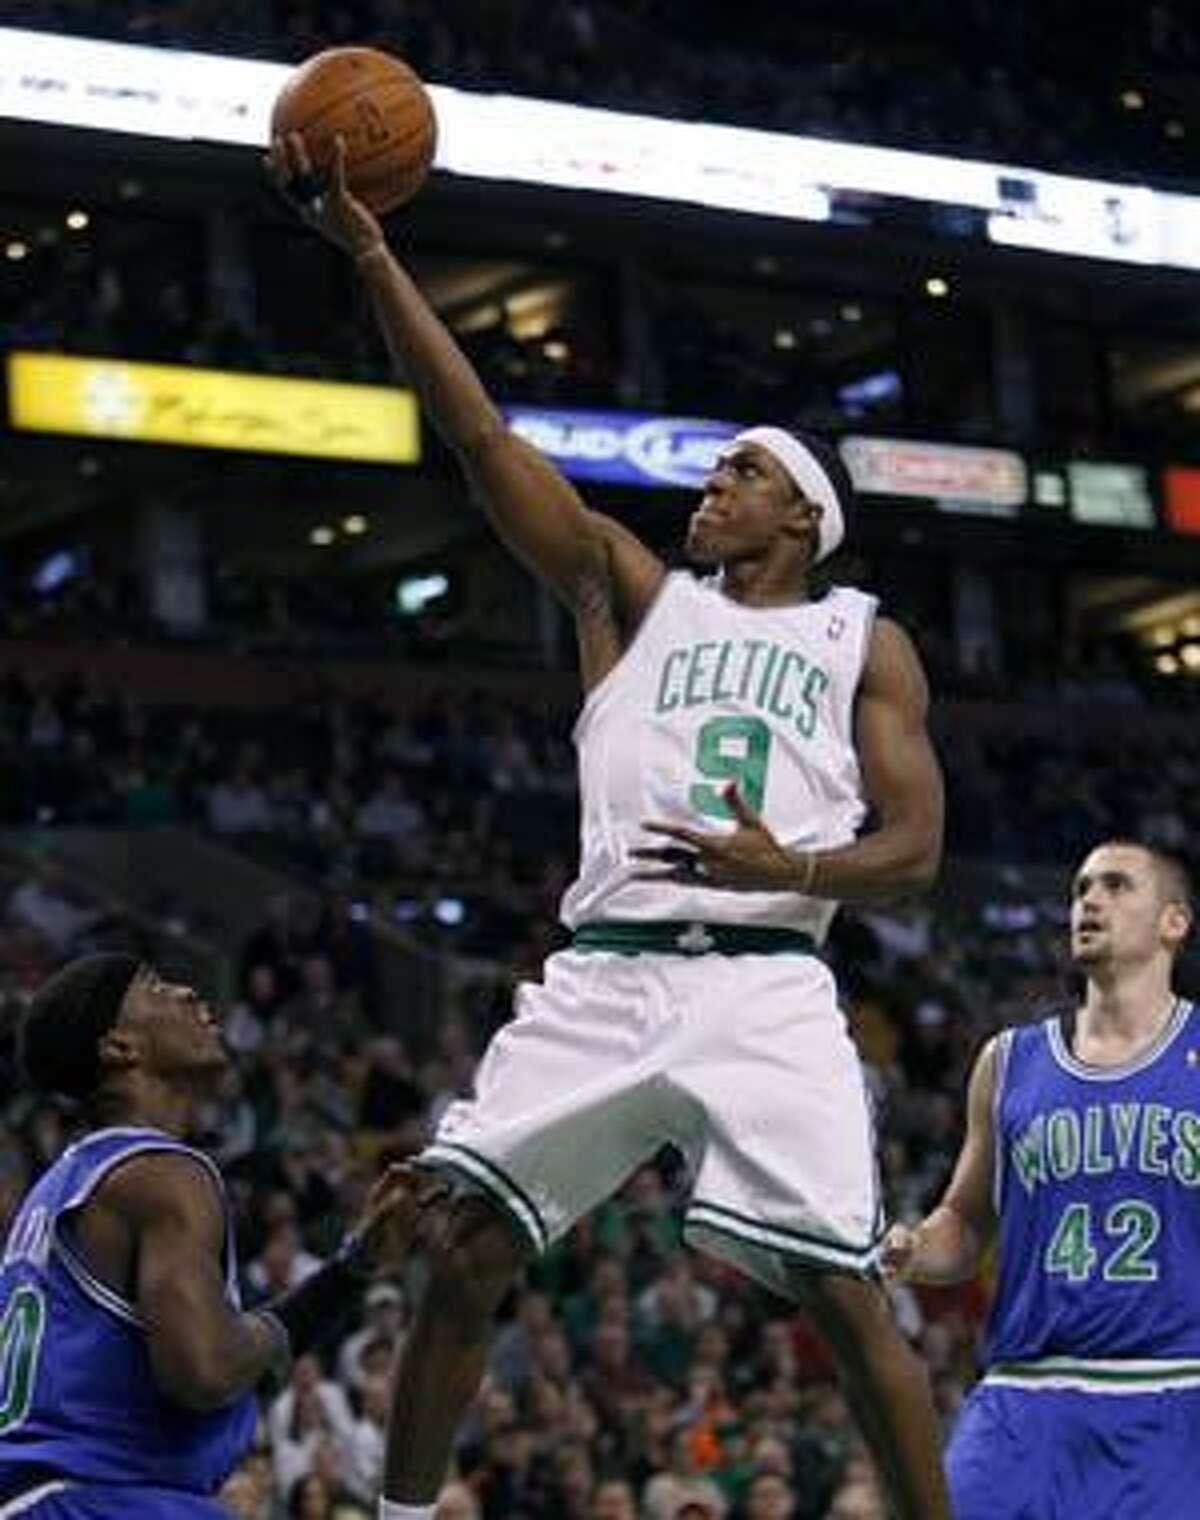 Boston Celtics' Rajon Rondo (9) shoots over Minnesota Timberwolves' Jonny Flynn, left, as Kevin Love (42) looks on during the first quarter Sunday in Boston.